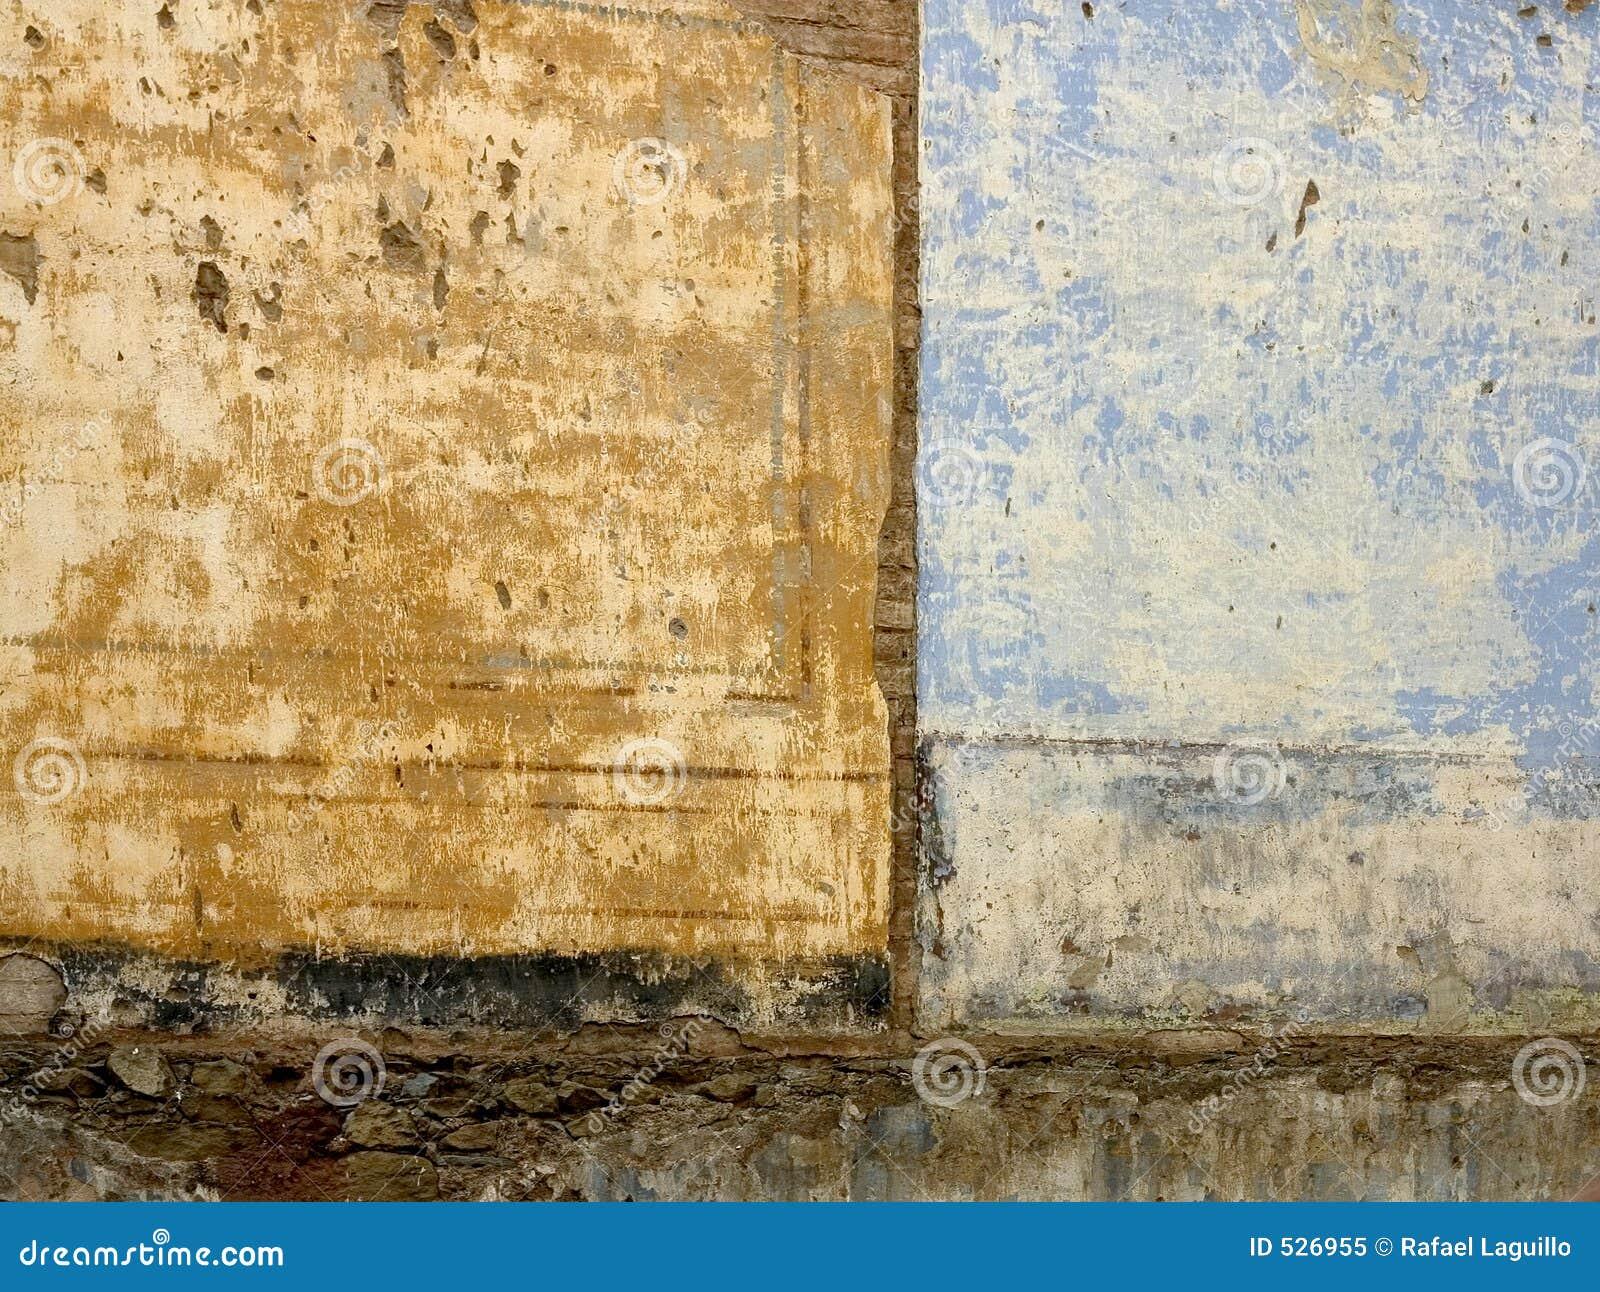 Download 纹理墙壁 库存图片. 图片 包括有 色土, 墙壁, 纹理, 模式, 墙纸, 腐蚀, 织地不很细, grunge - 526955